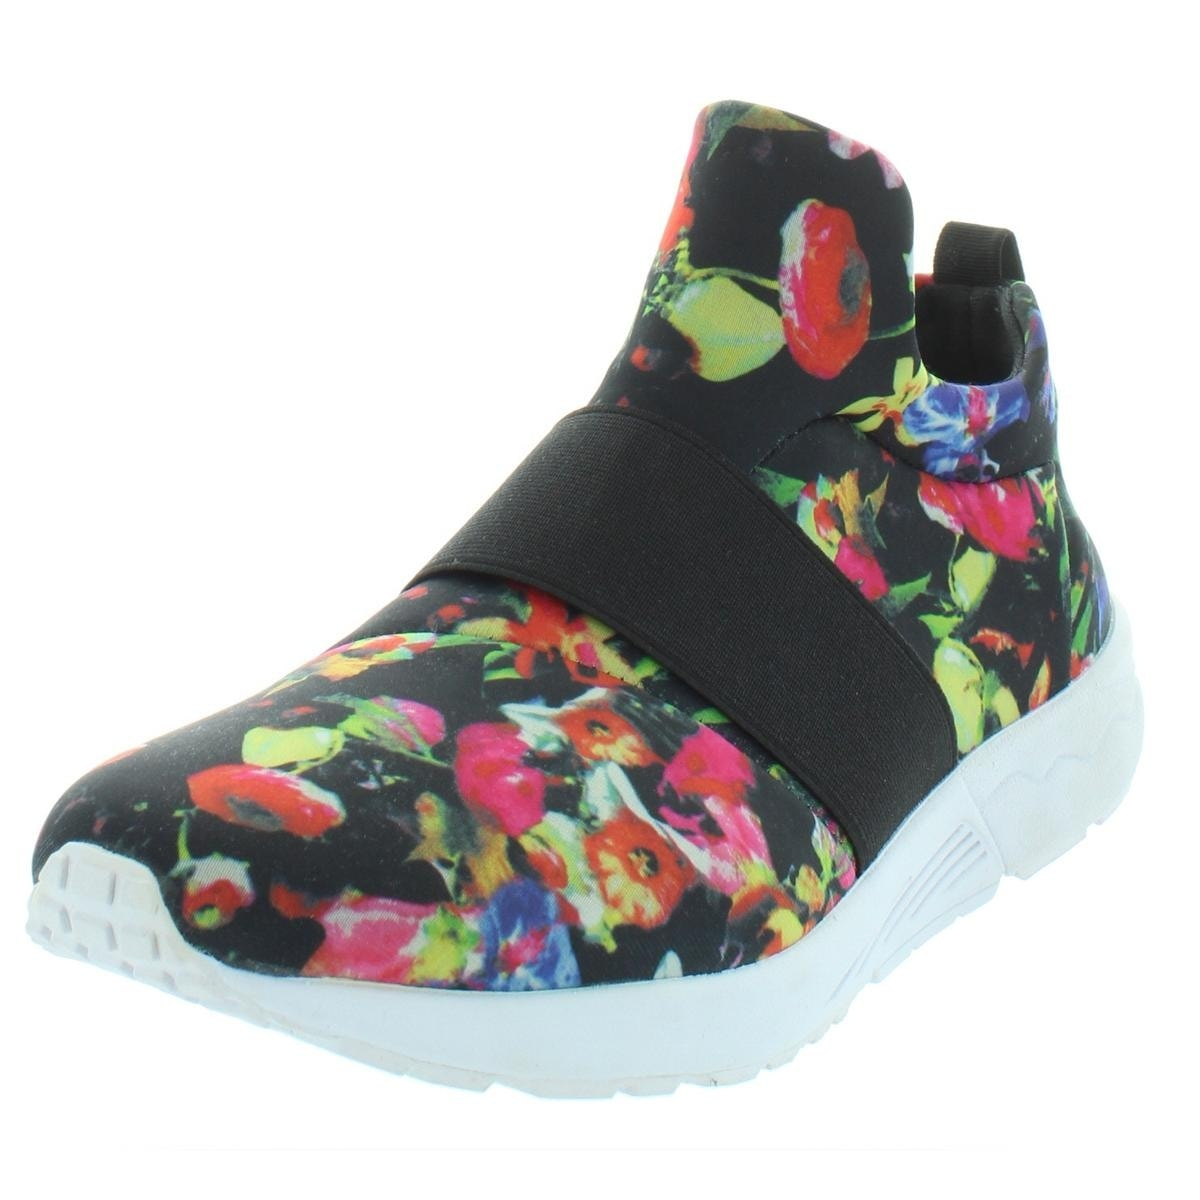 faee2ba5fb2 Shop Steve Madden Womens Hueber Fashion Sneakers Floral Print Low Top - 11  Medium (B